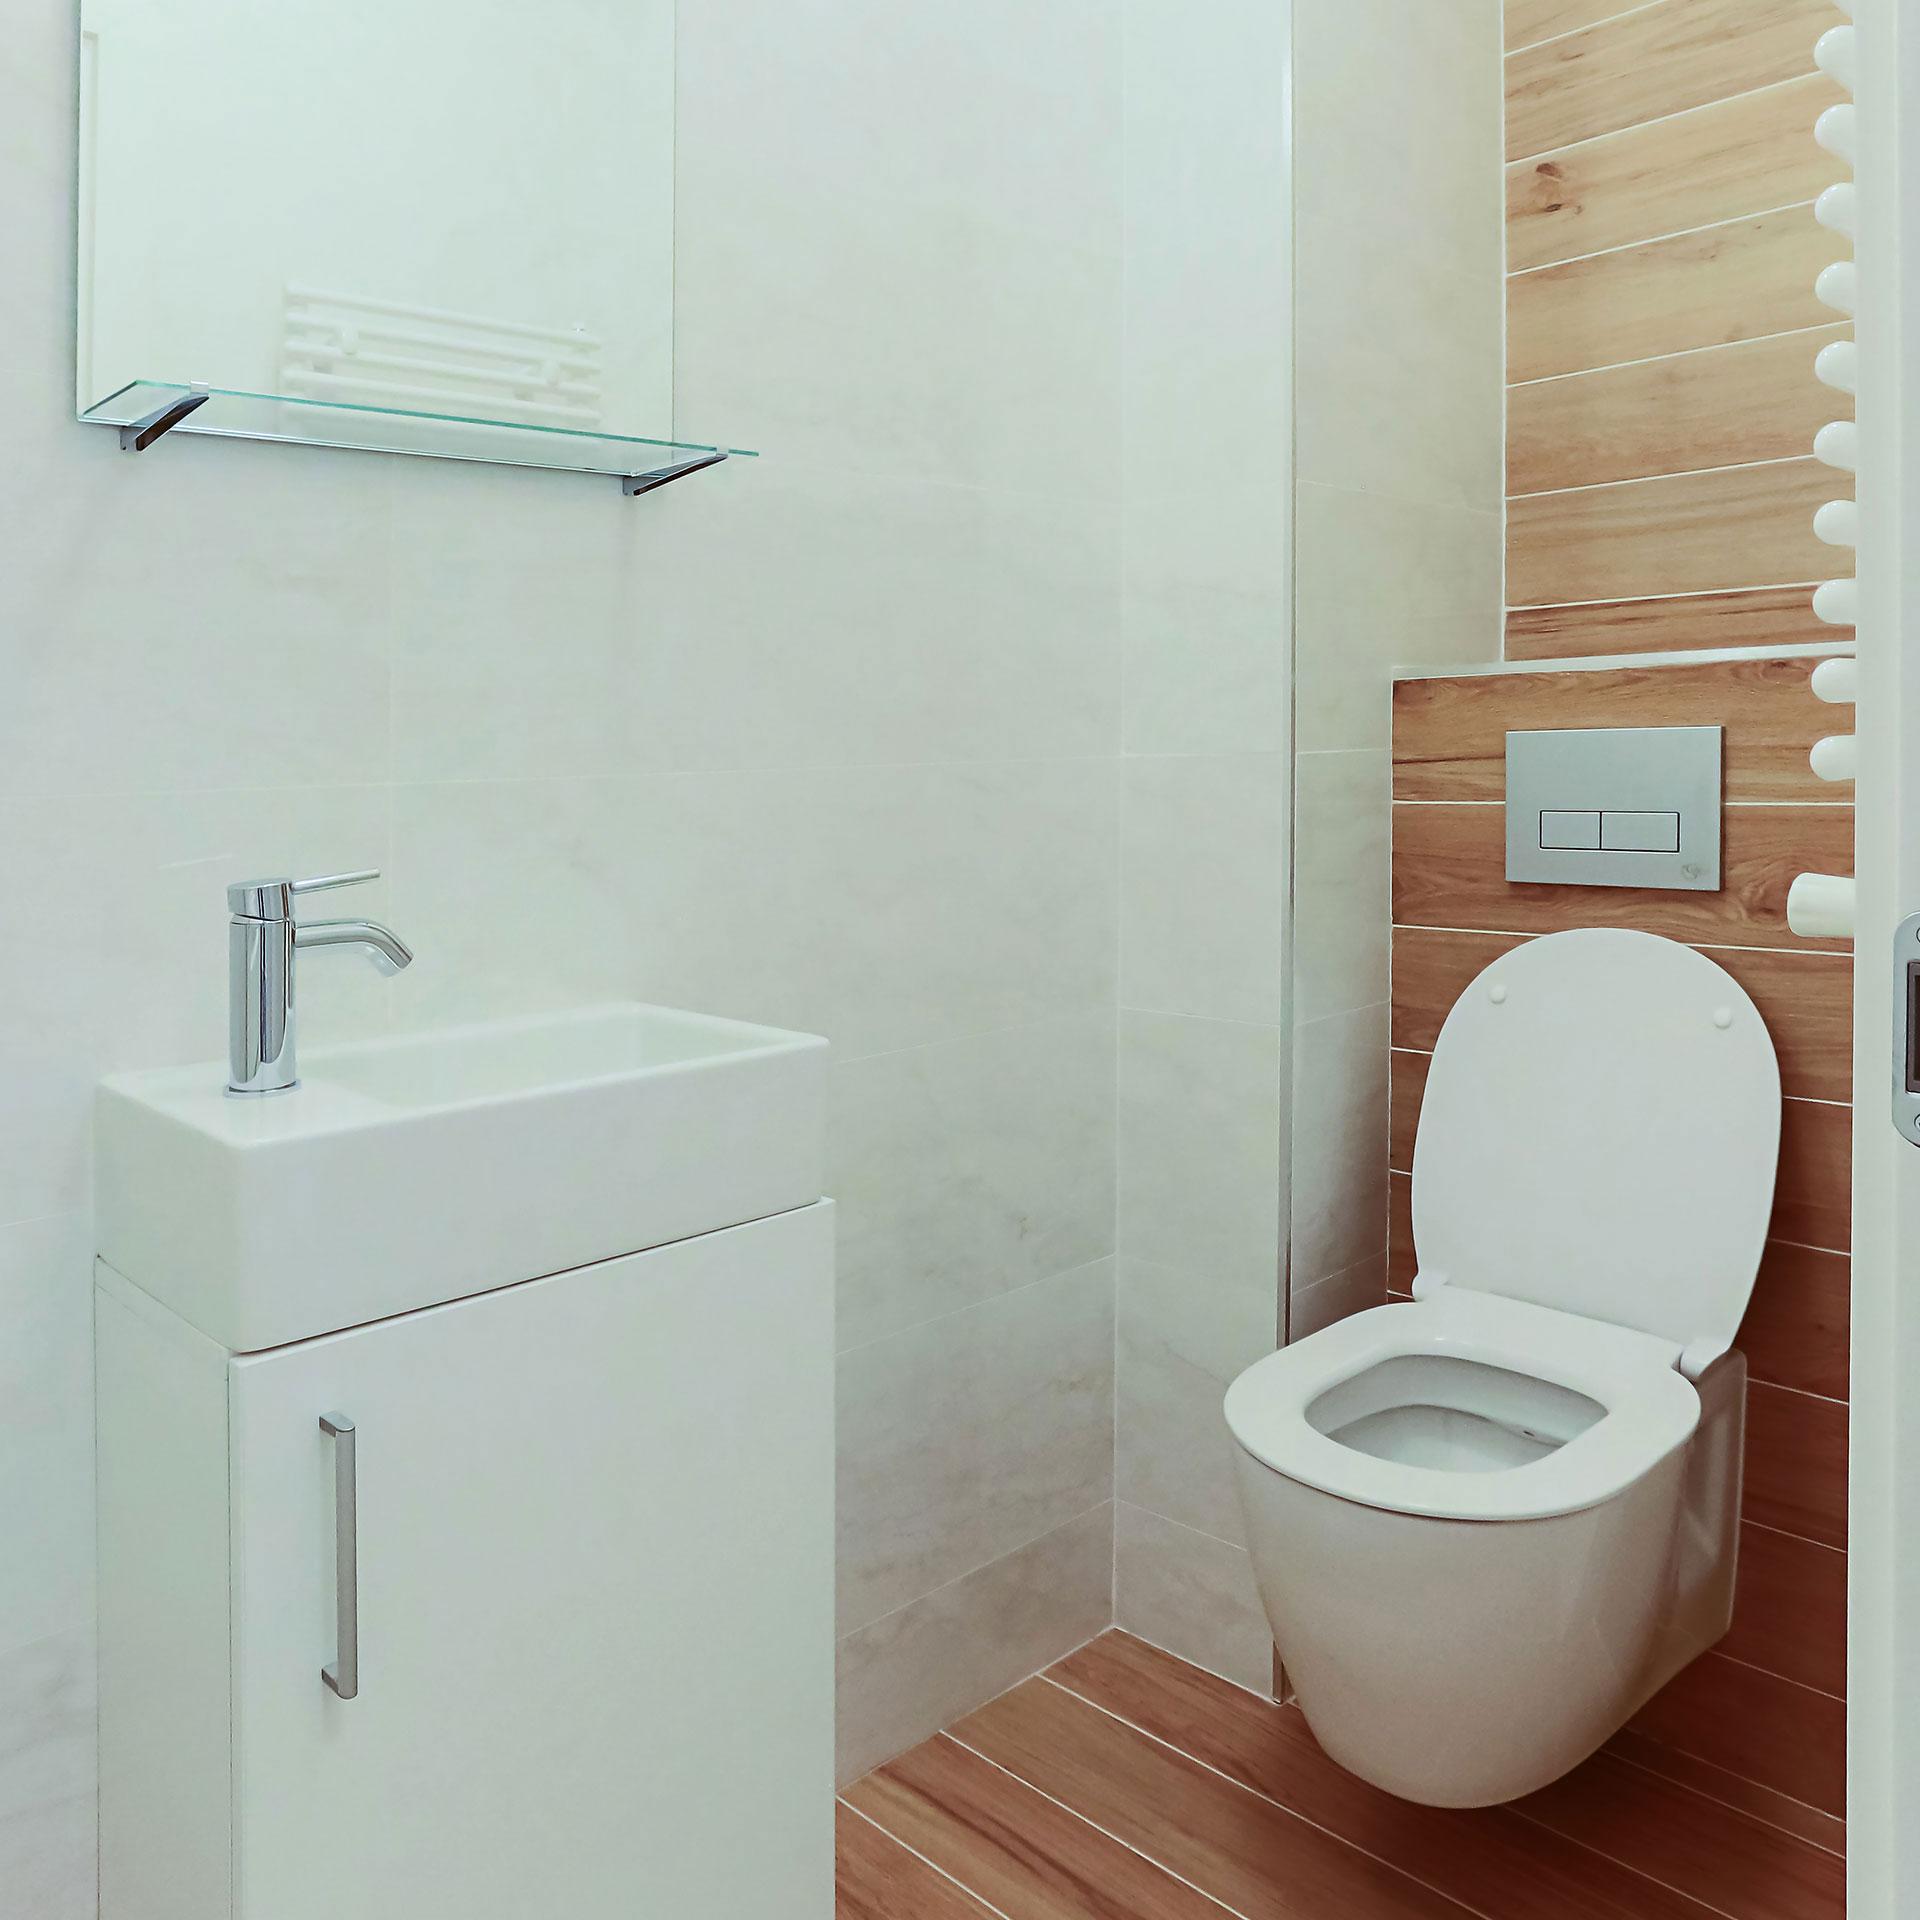 Apartamente de vanzare Bucuresti - Catedral Residence - Marriott, Piata Unirii, 13 Septembrie, Izvor - G4 - 13